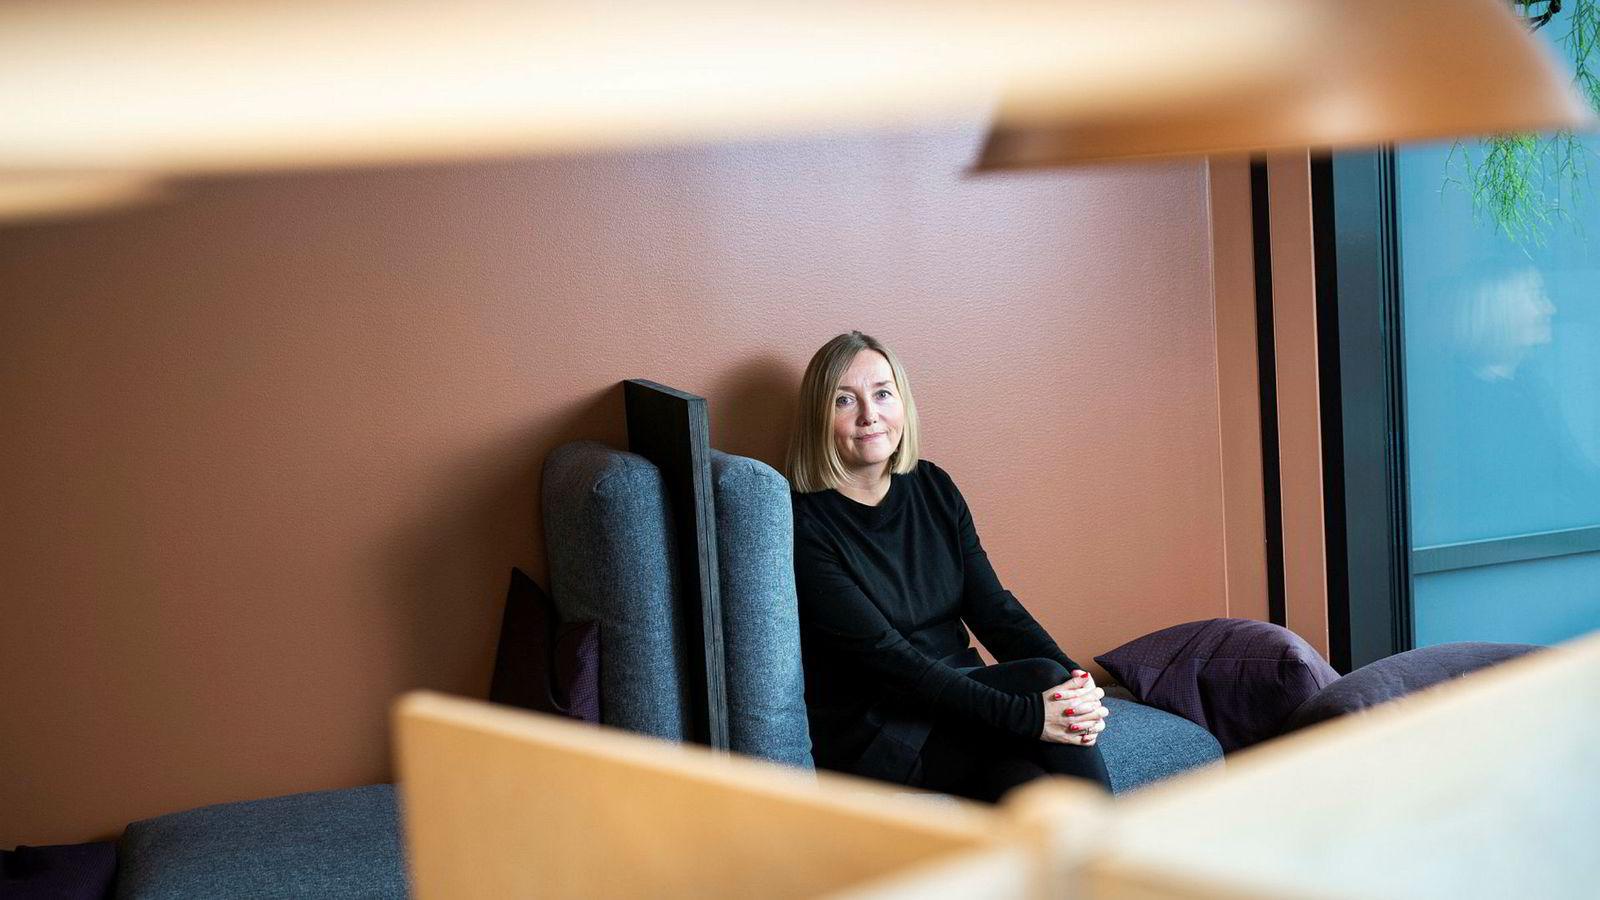 Daglig leder i Trigger, Bente Kvam Kristoffersen, i selskapets lokaler i Torggata i Oslo.